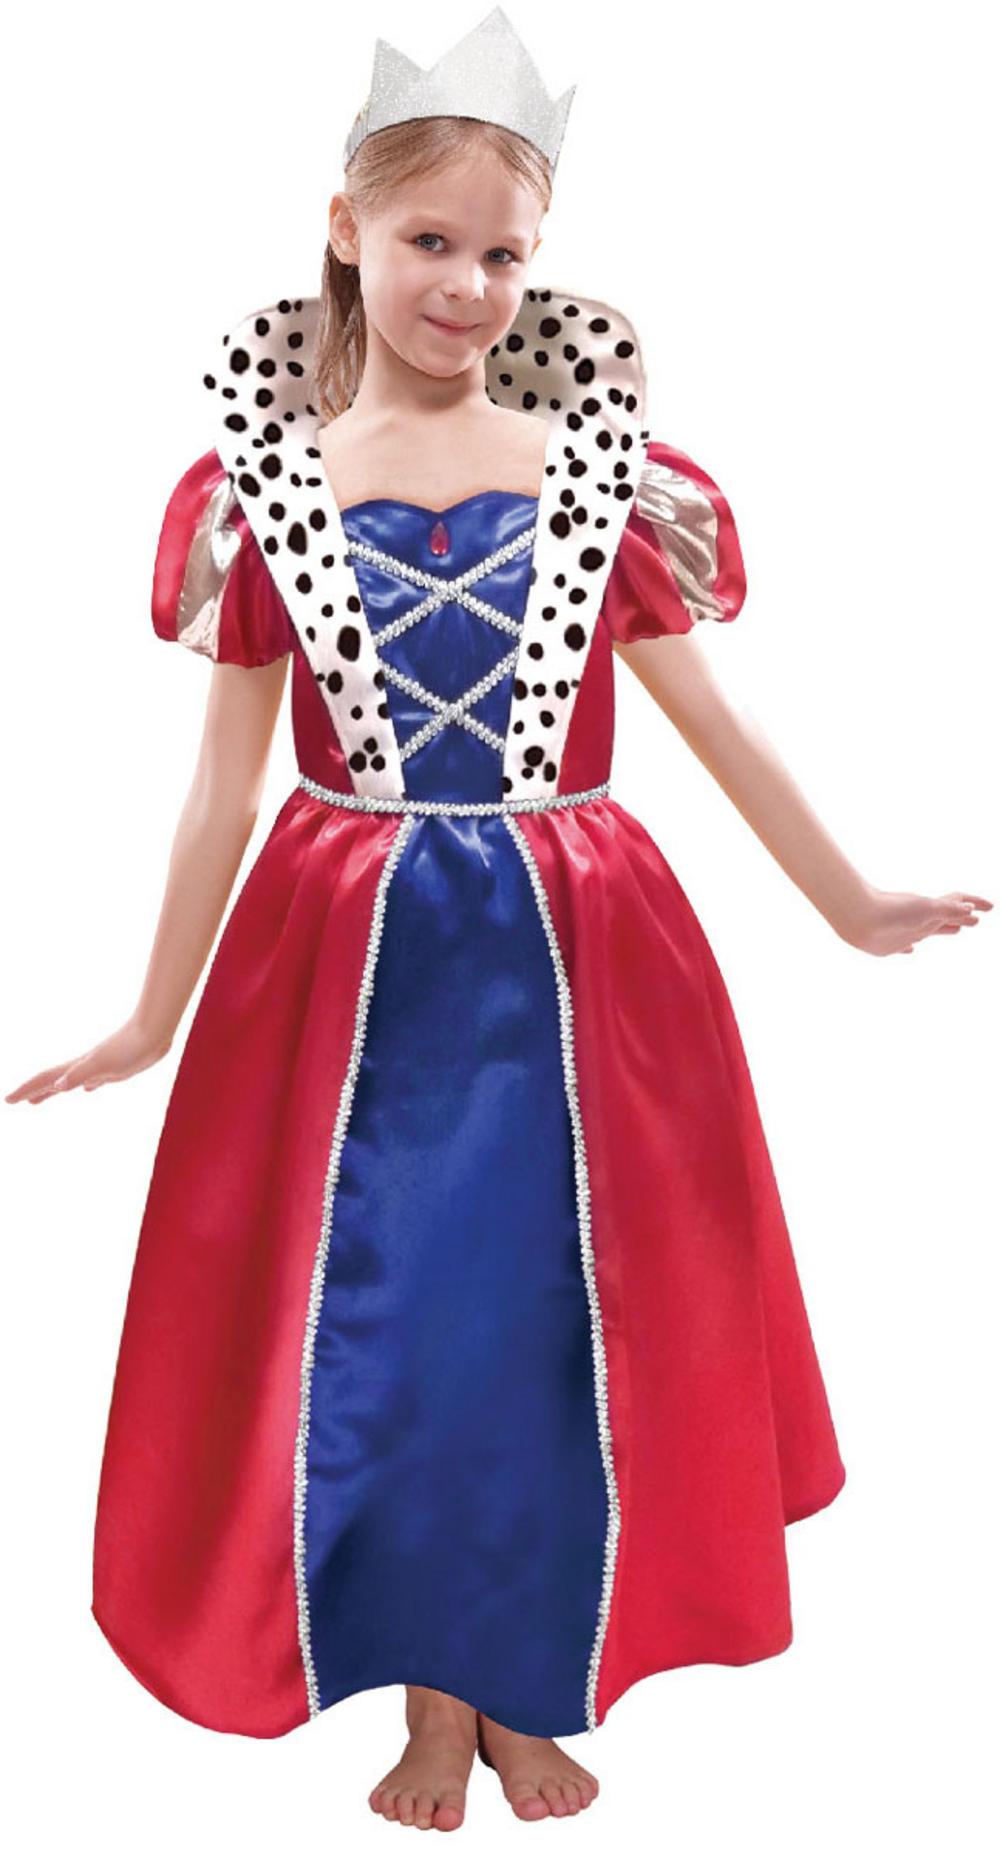 world Book Day Fancy Dress Princess Queen Crown Tiara Kind Prince Fairy Tale